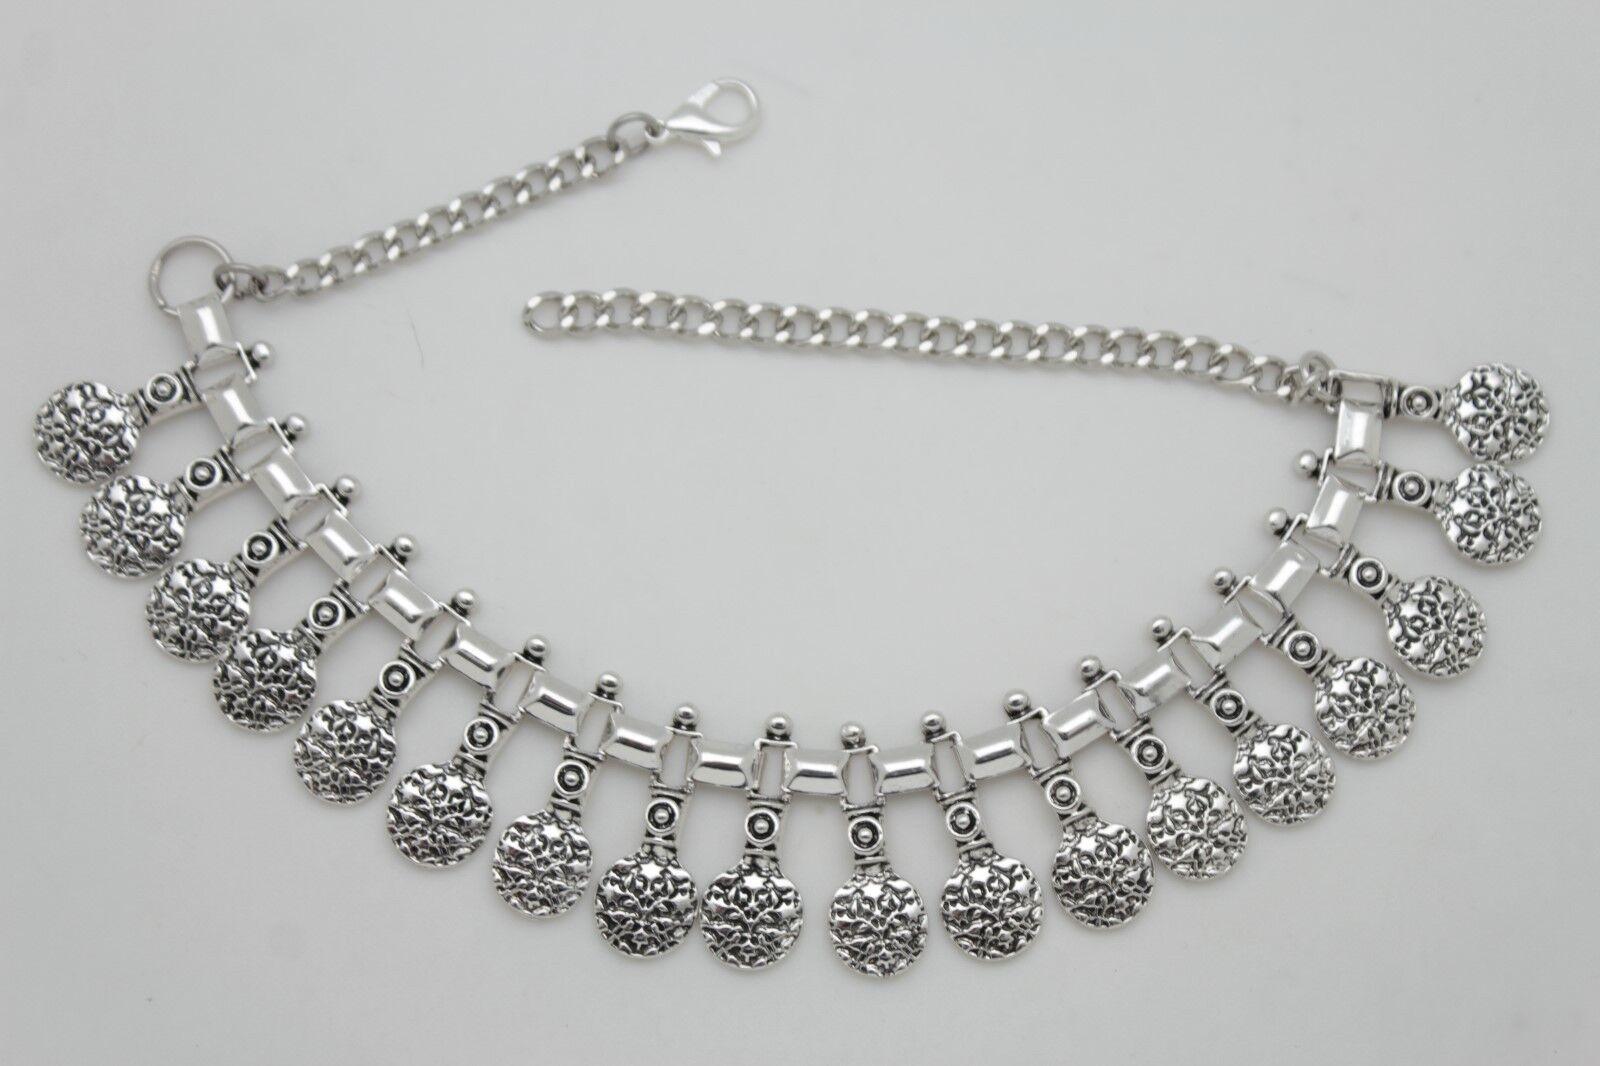 Hot Women Fashion Boot Chain Bracelet Silver Metal Multi Coins Shoe Ethnic Charm